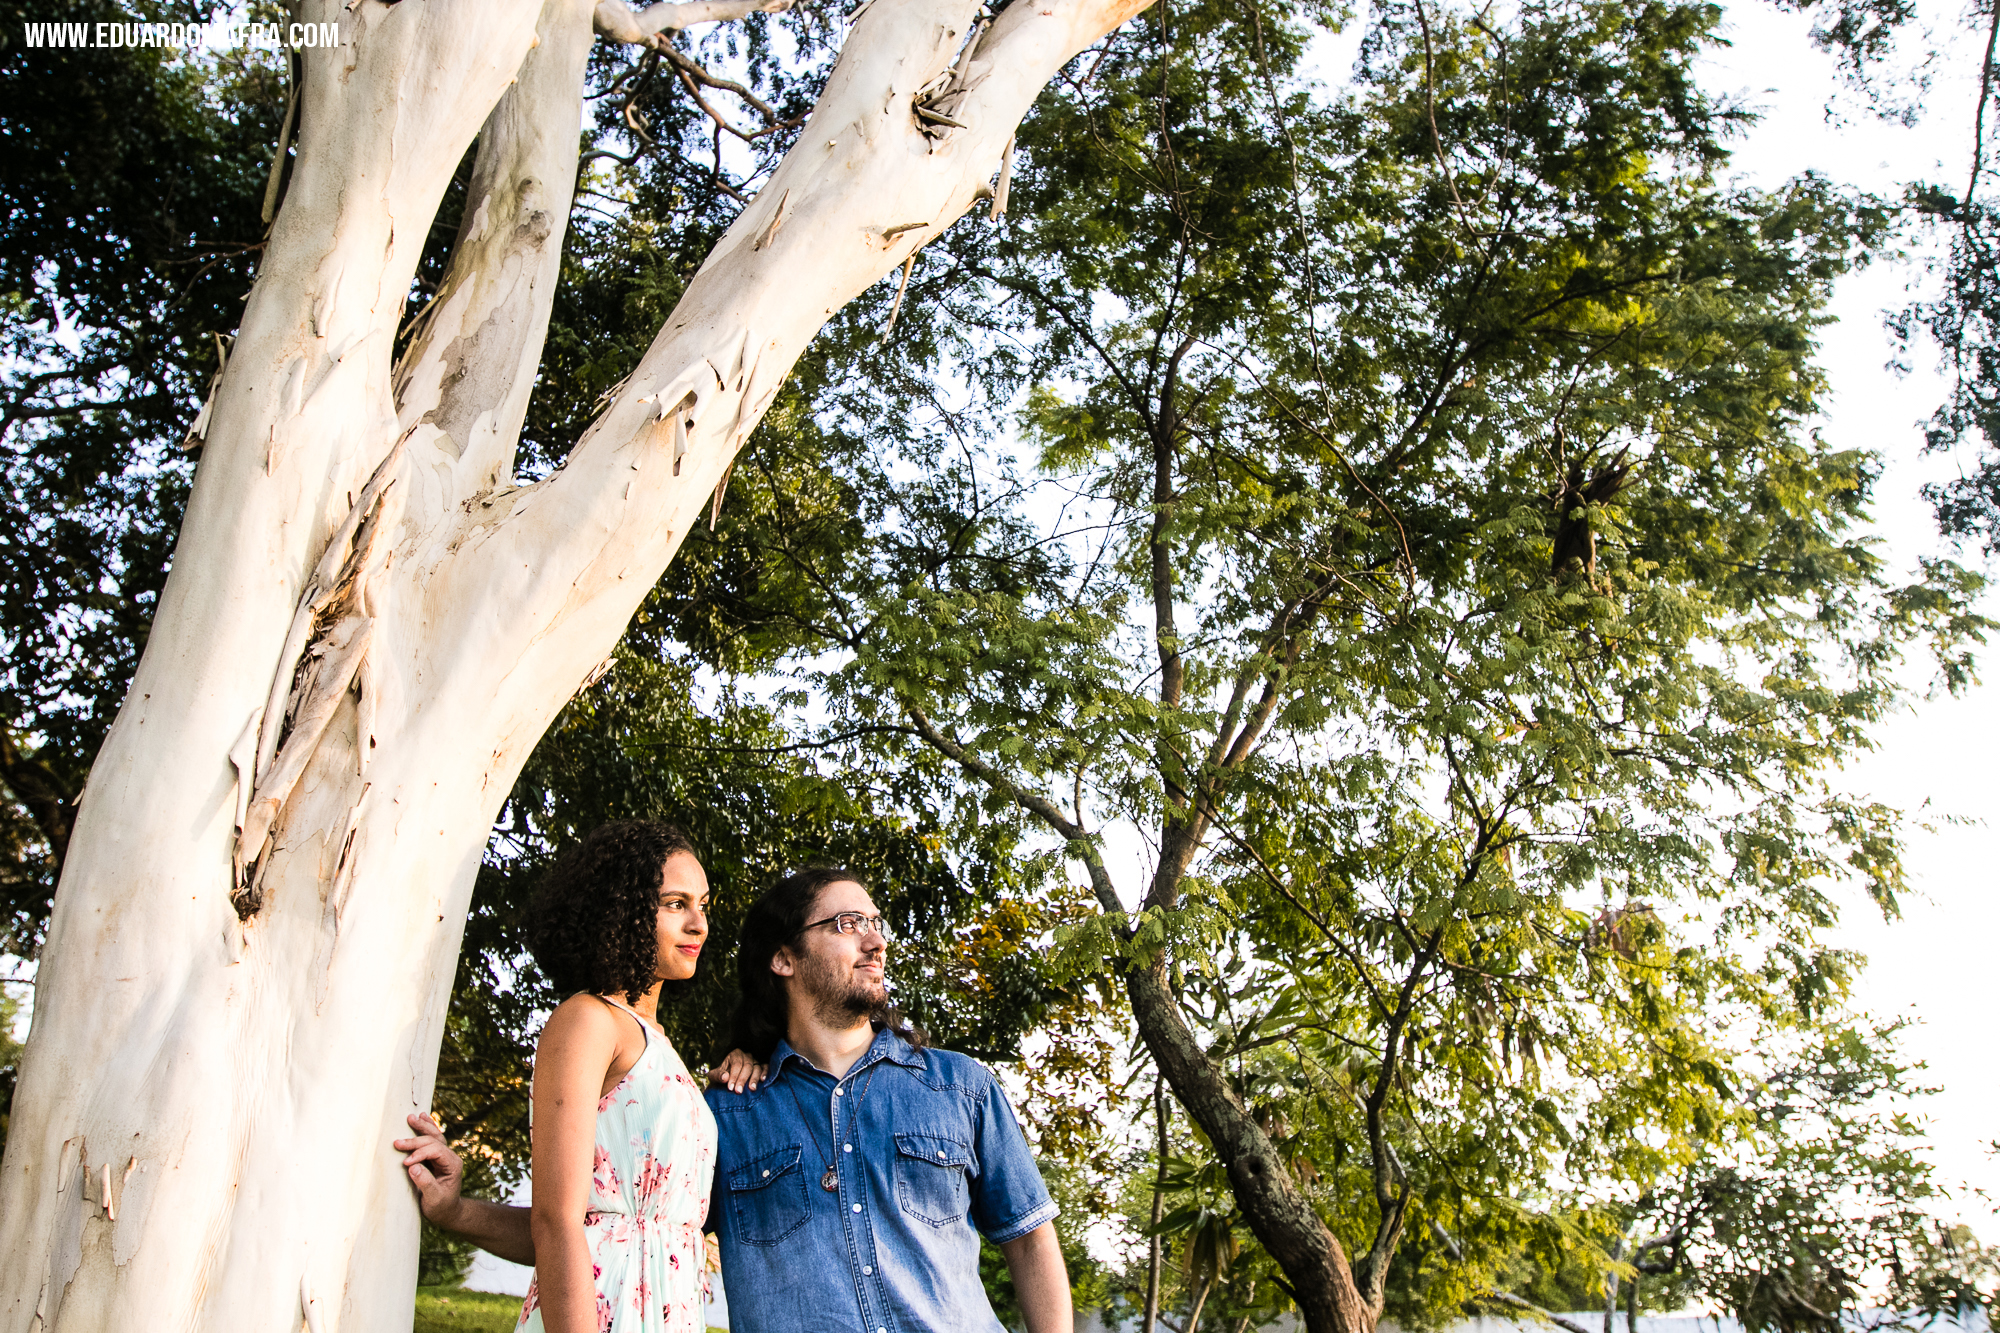 Ensaio fotográfico casal Carol e Tássio Salvador Lauro de Freitas fotógrafo profissional Vilas do Atlântico casamento noivado (3)